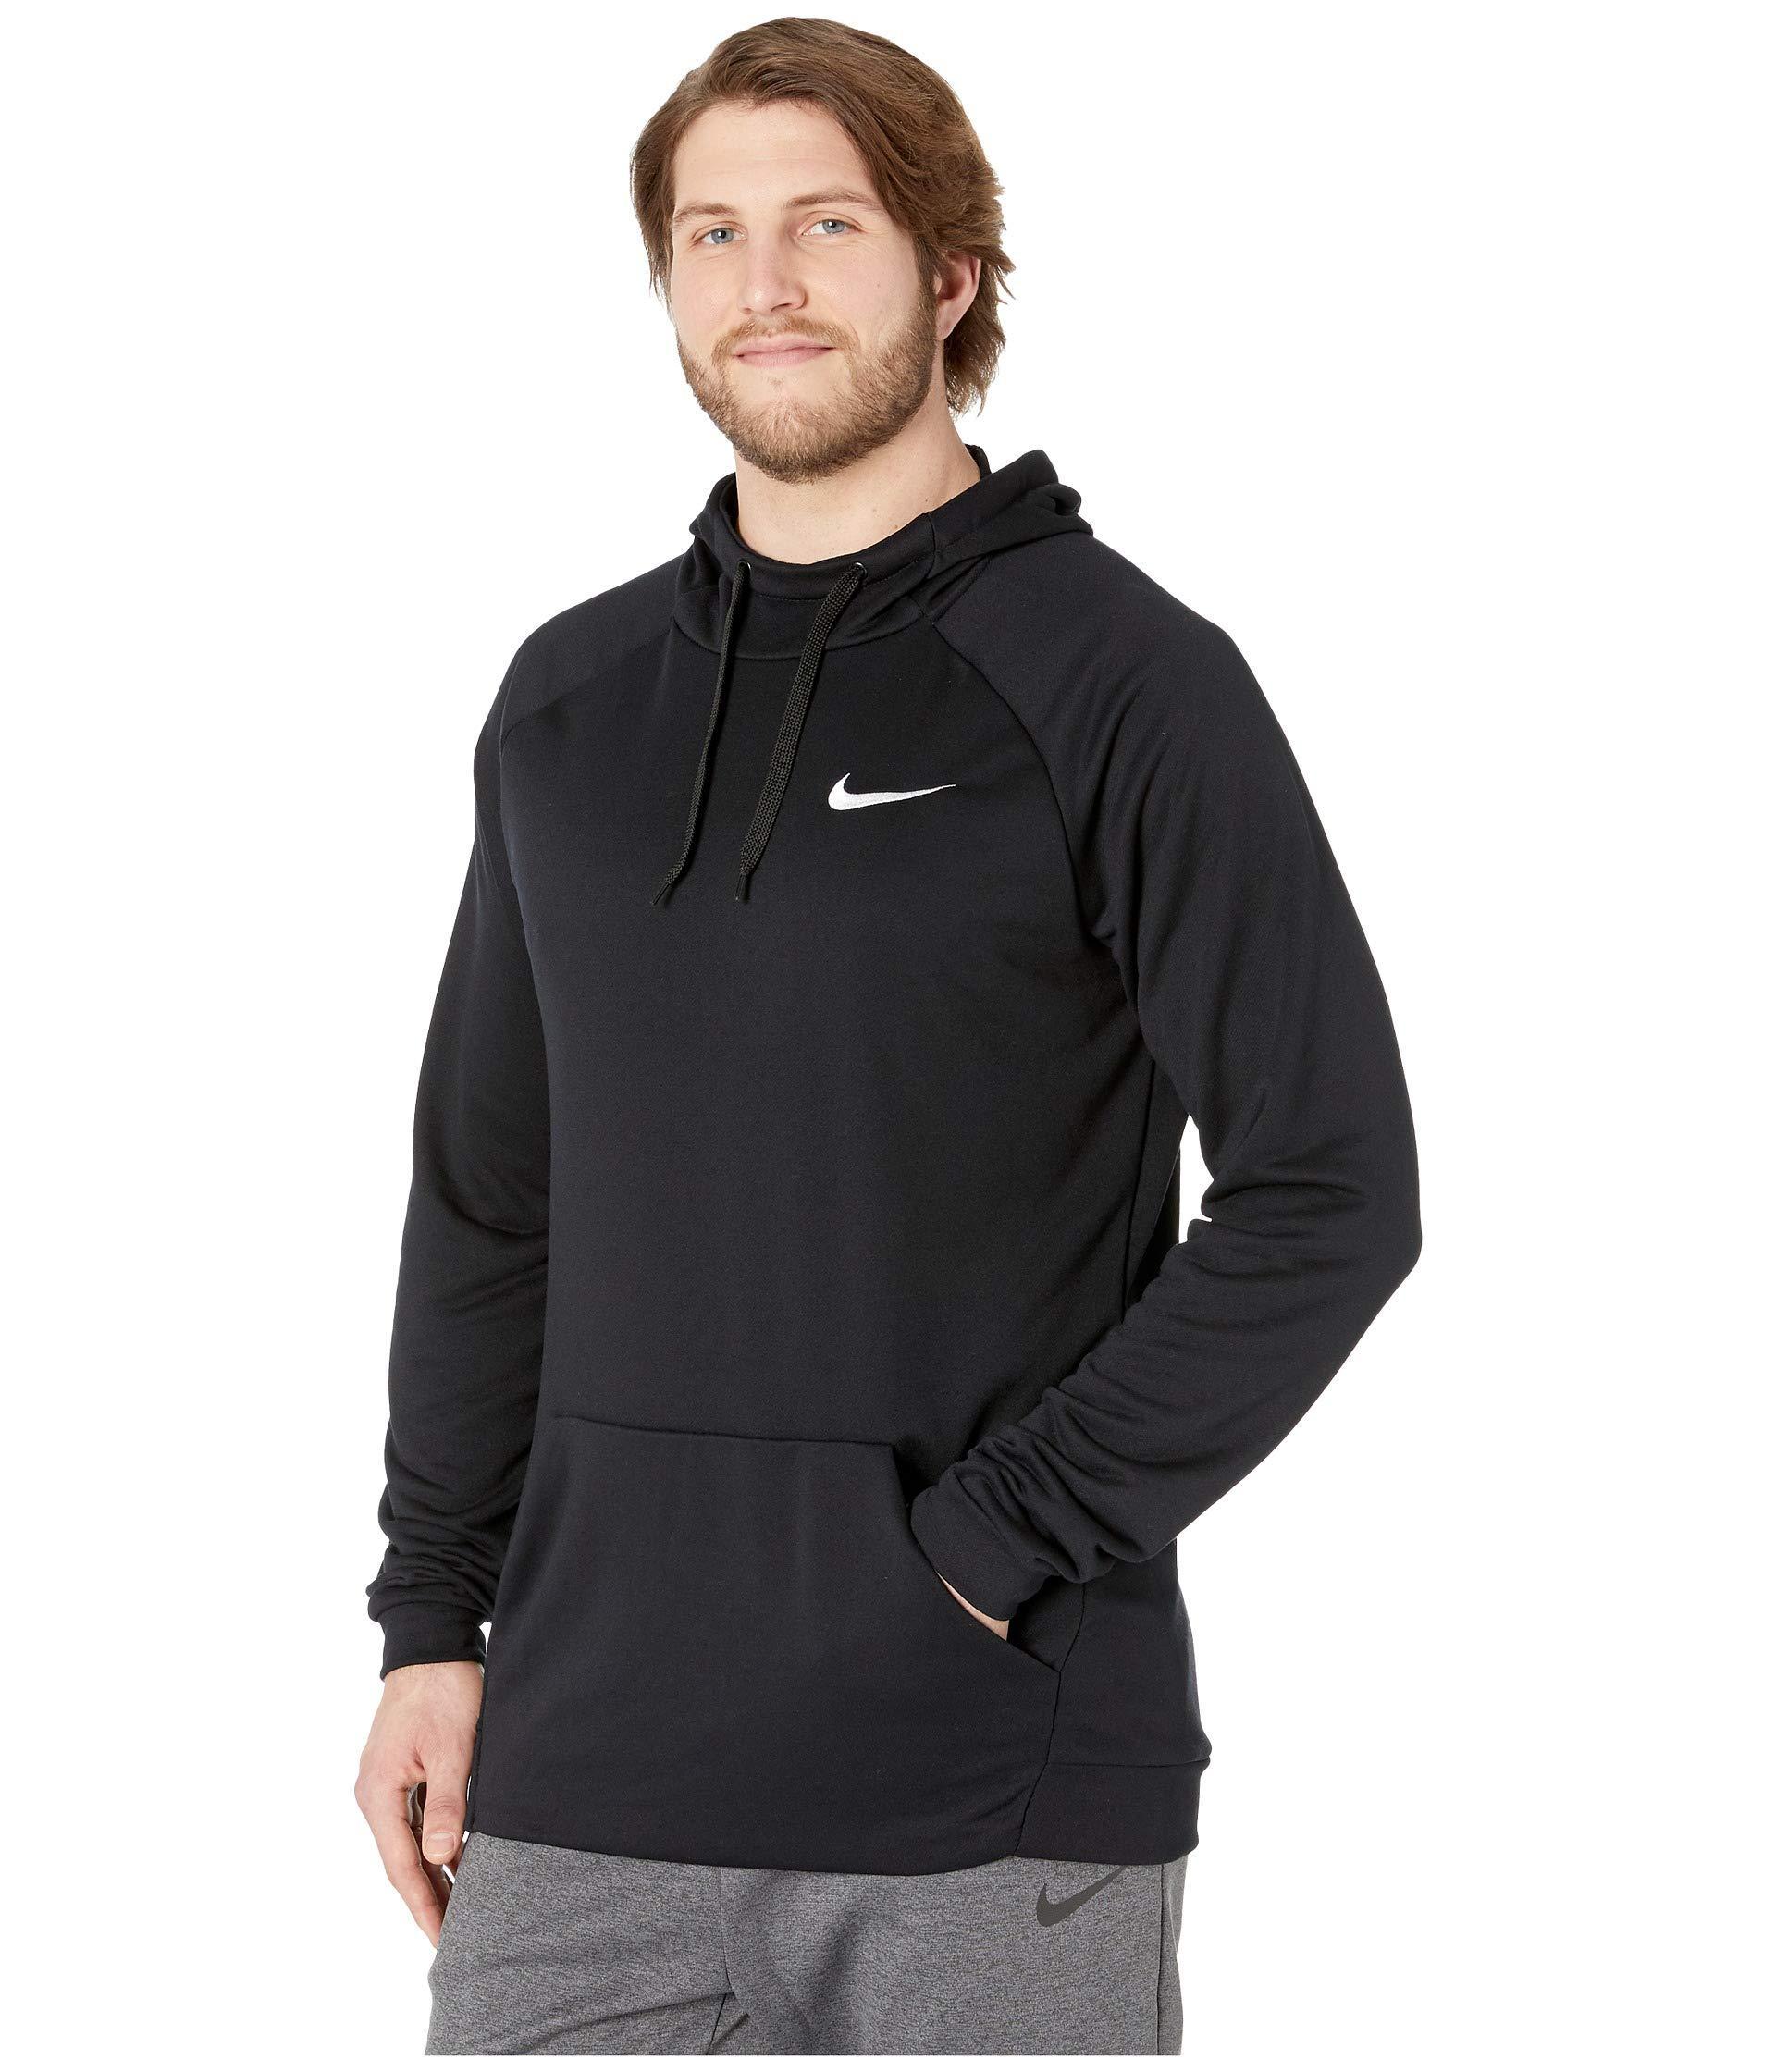 5179ccb585 Lyst - Nike Big Tall Dry Hoodie Pullover Fleece (black white) Men s  Sweatshirt in Black for Men